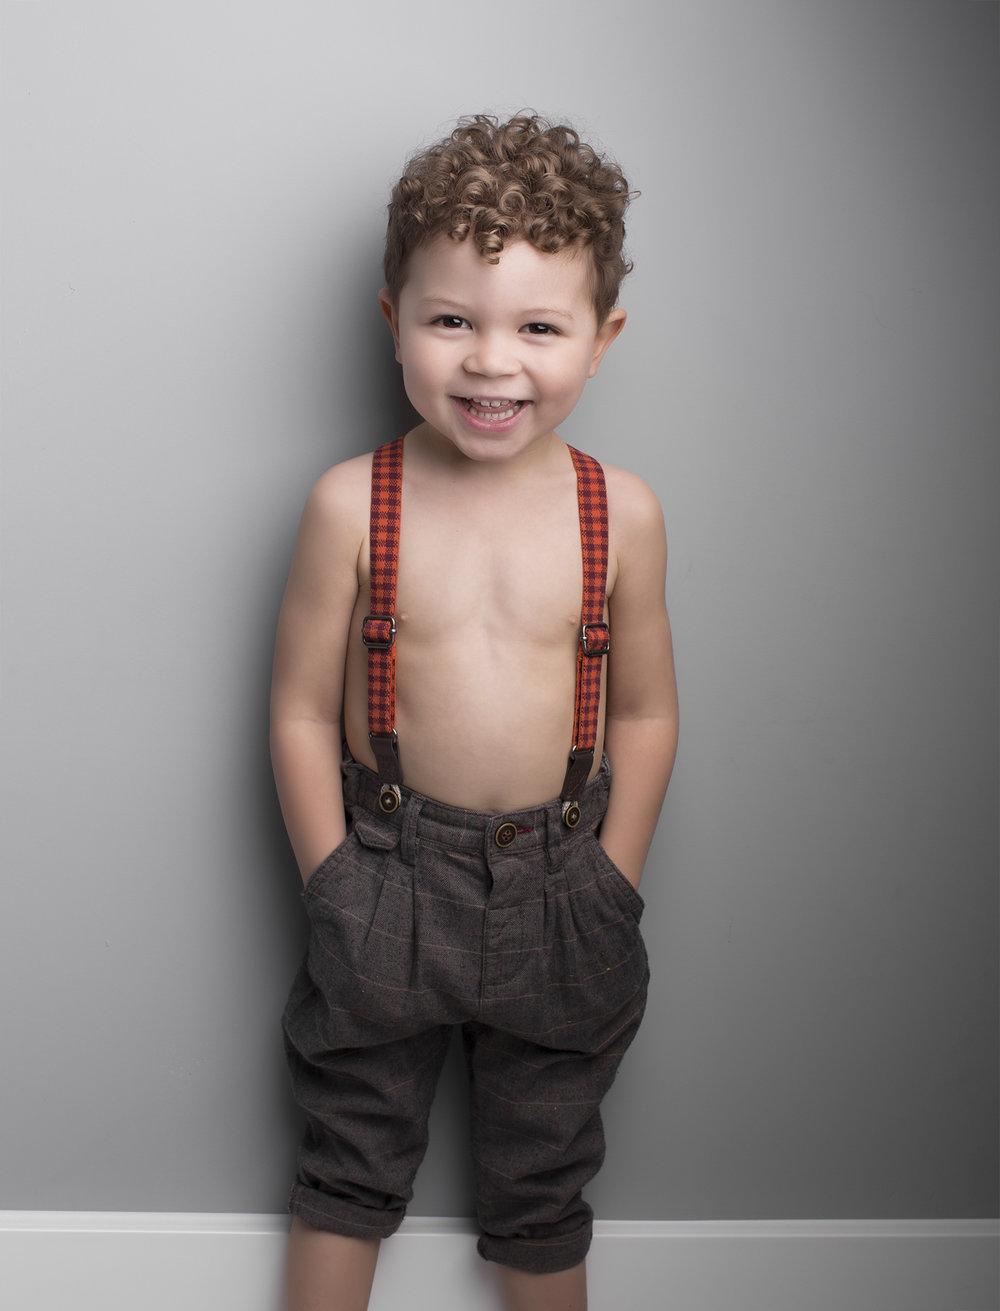 elizabethgphotography_fineart_kingslangley_hertfordshire_child_model_hudson.jpg